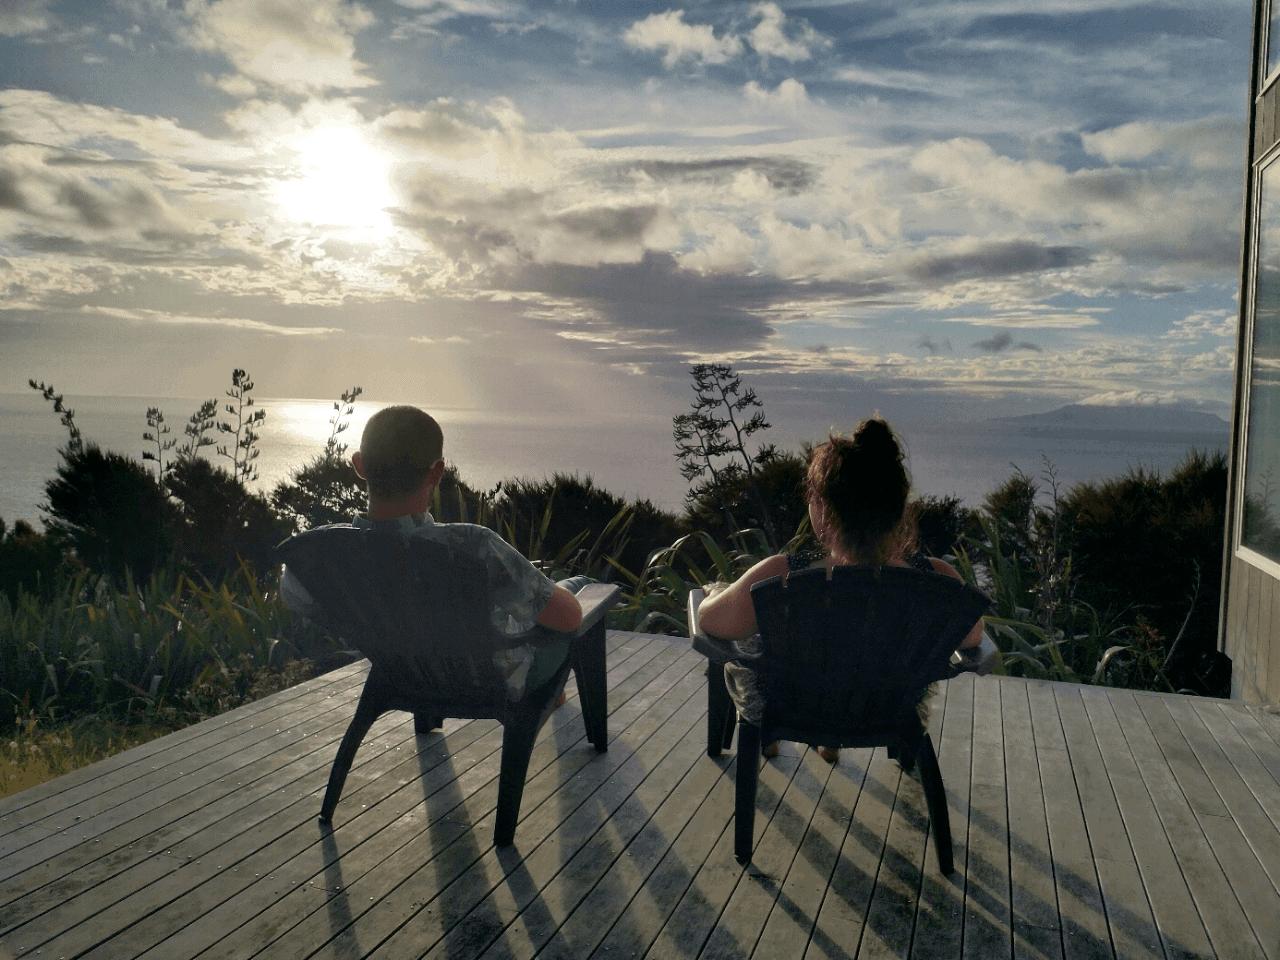 #XSPOTgbi great barrier island accommodation